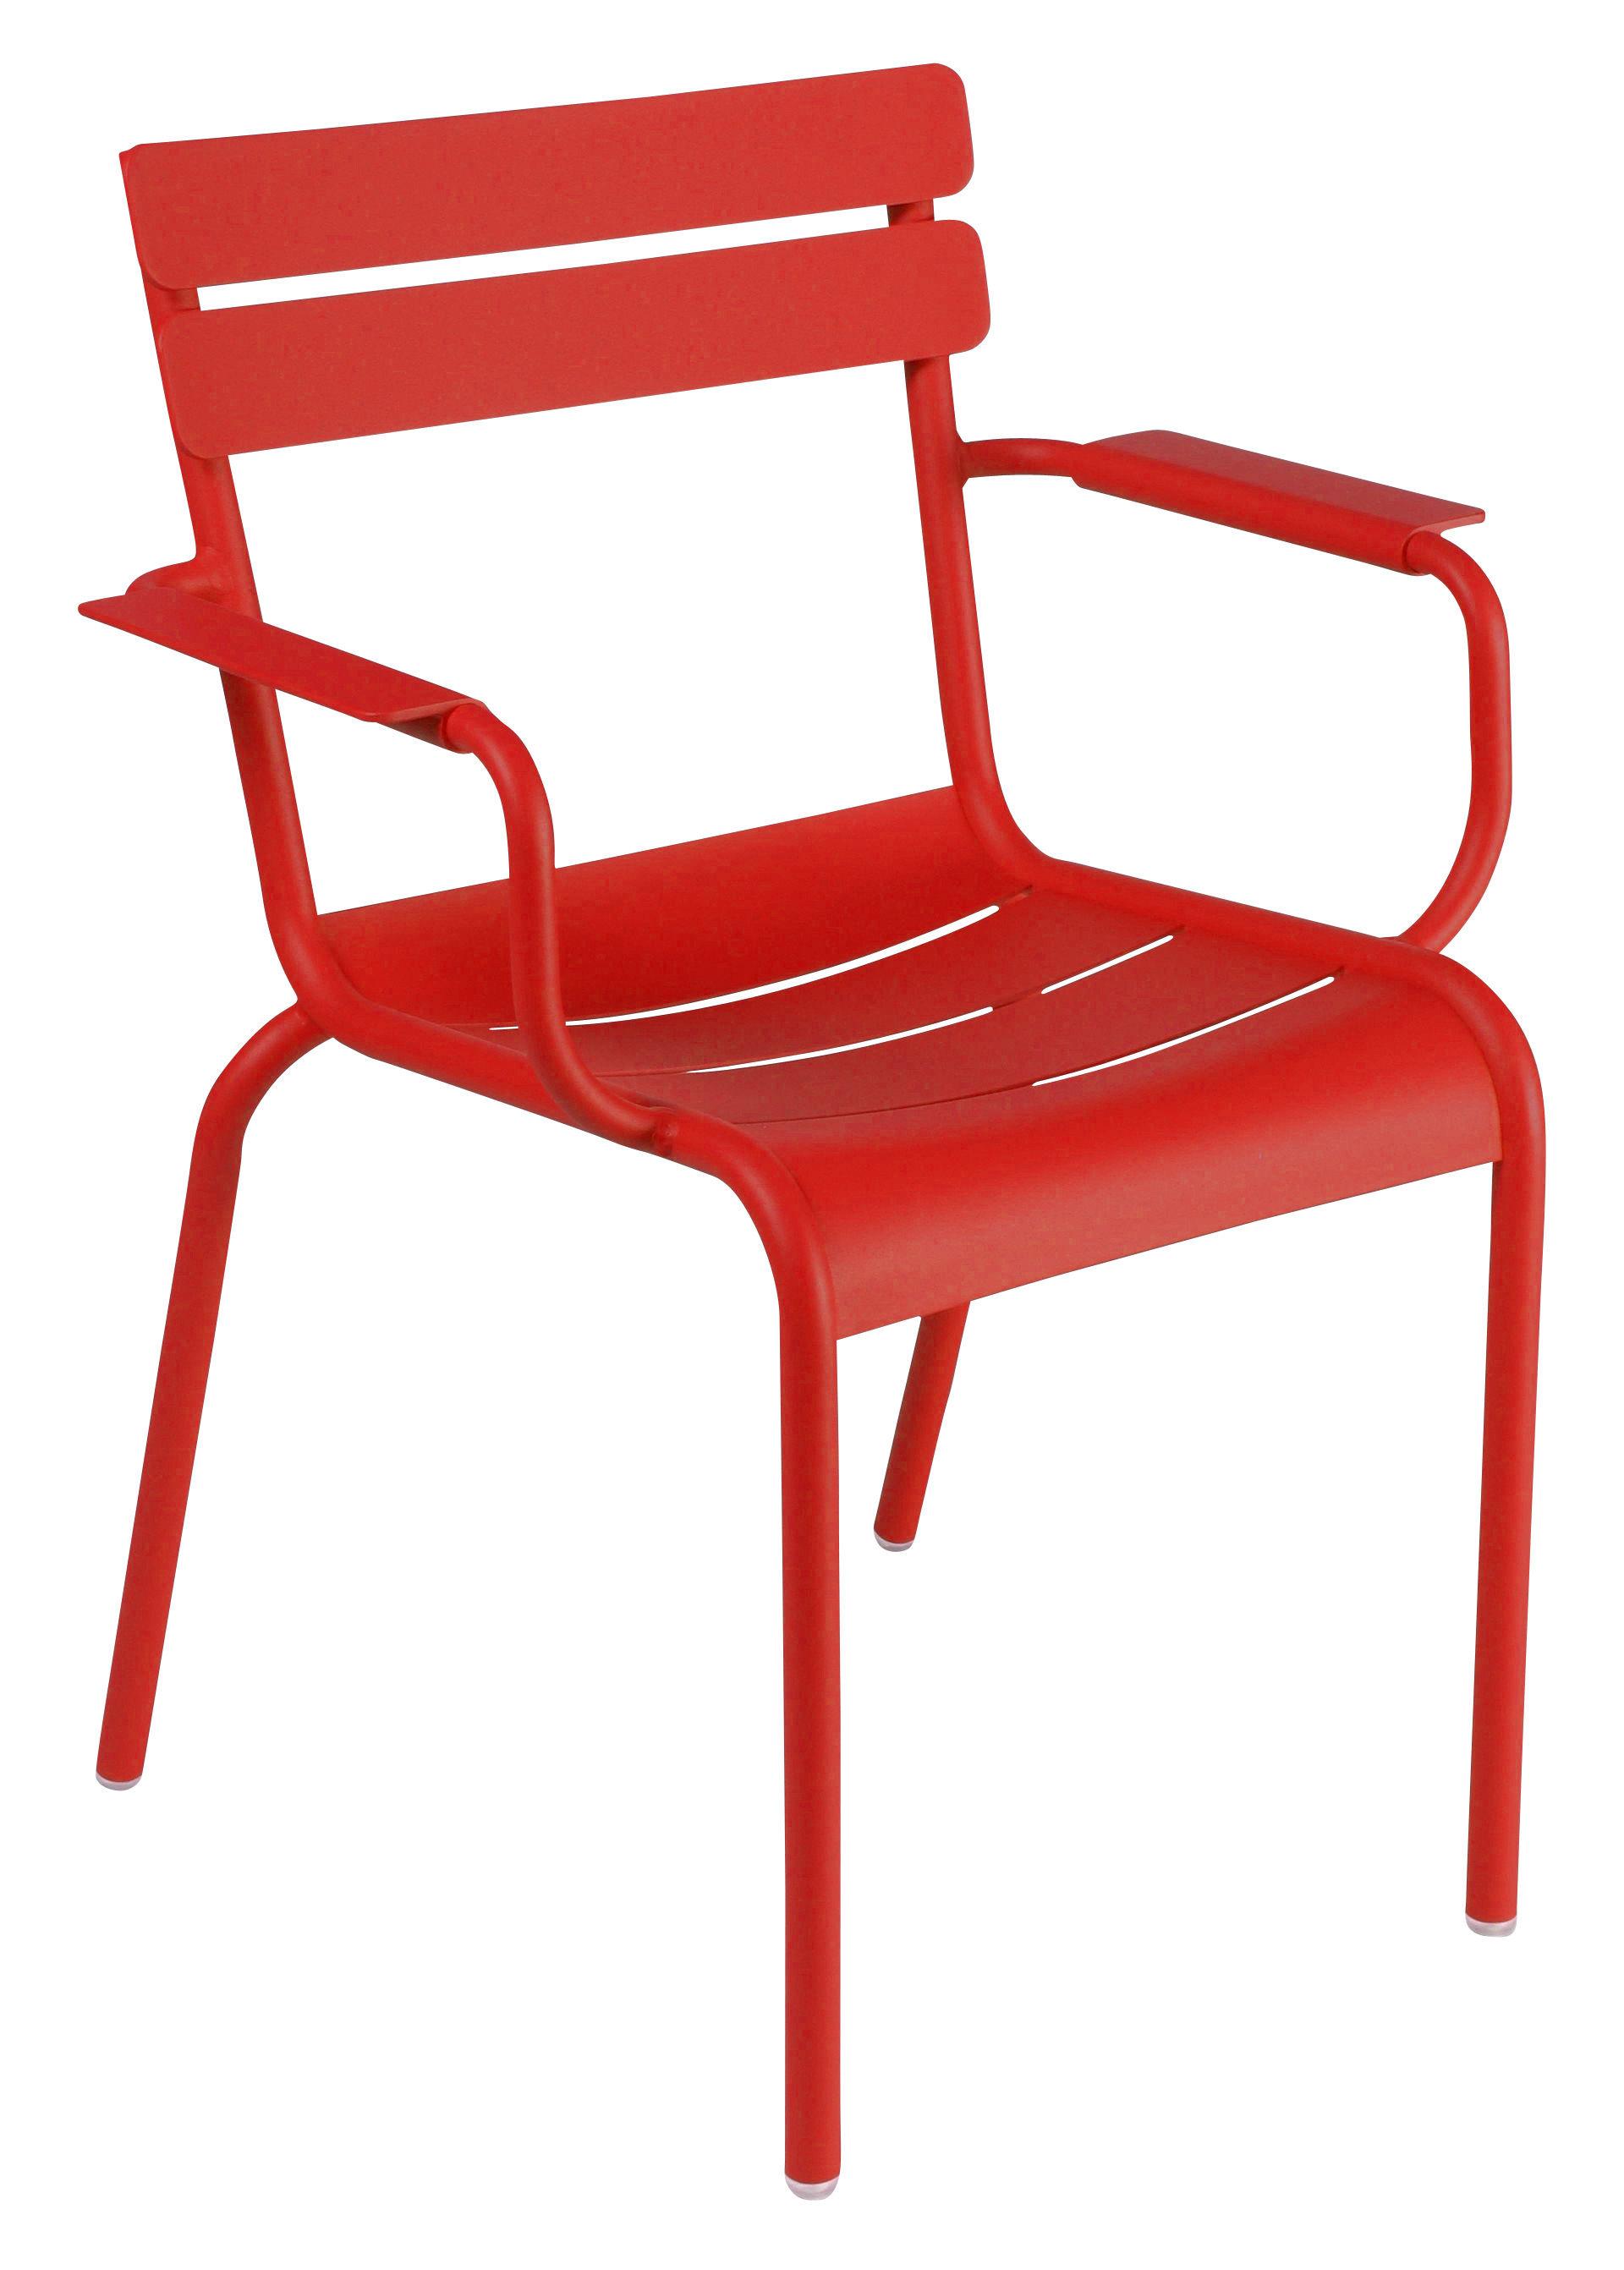 fauteuil empilable luxembourg aluminium coquelicot fermob. Black Bedroom Furniture Sets. Home Design Ideas